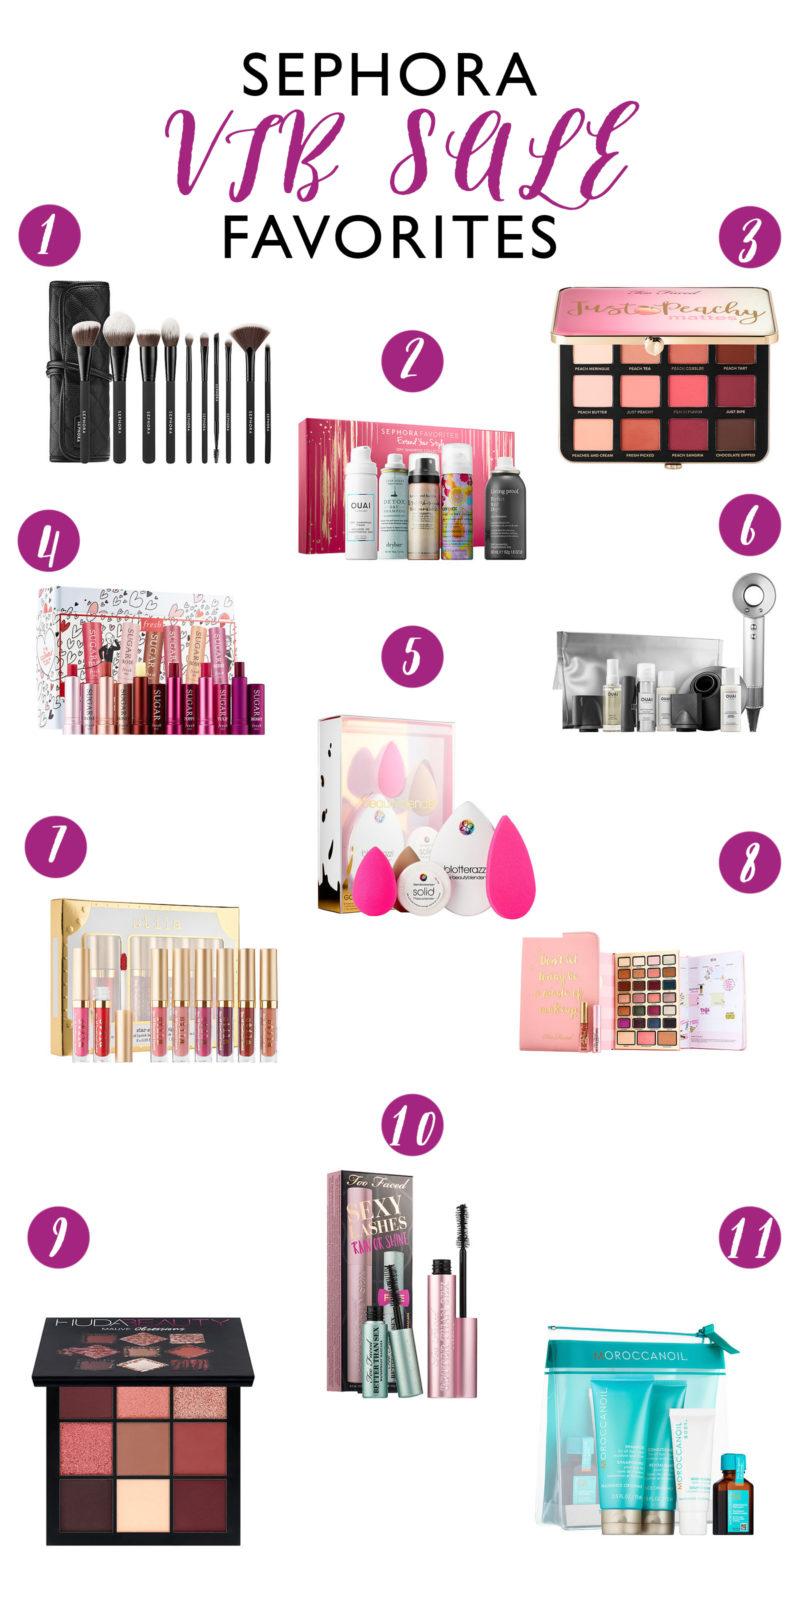 Petite Fashion and Style Blog | Sephora VIB Sale Favorites